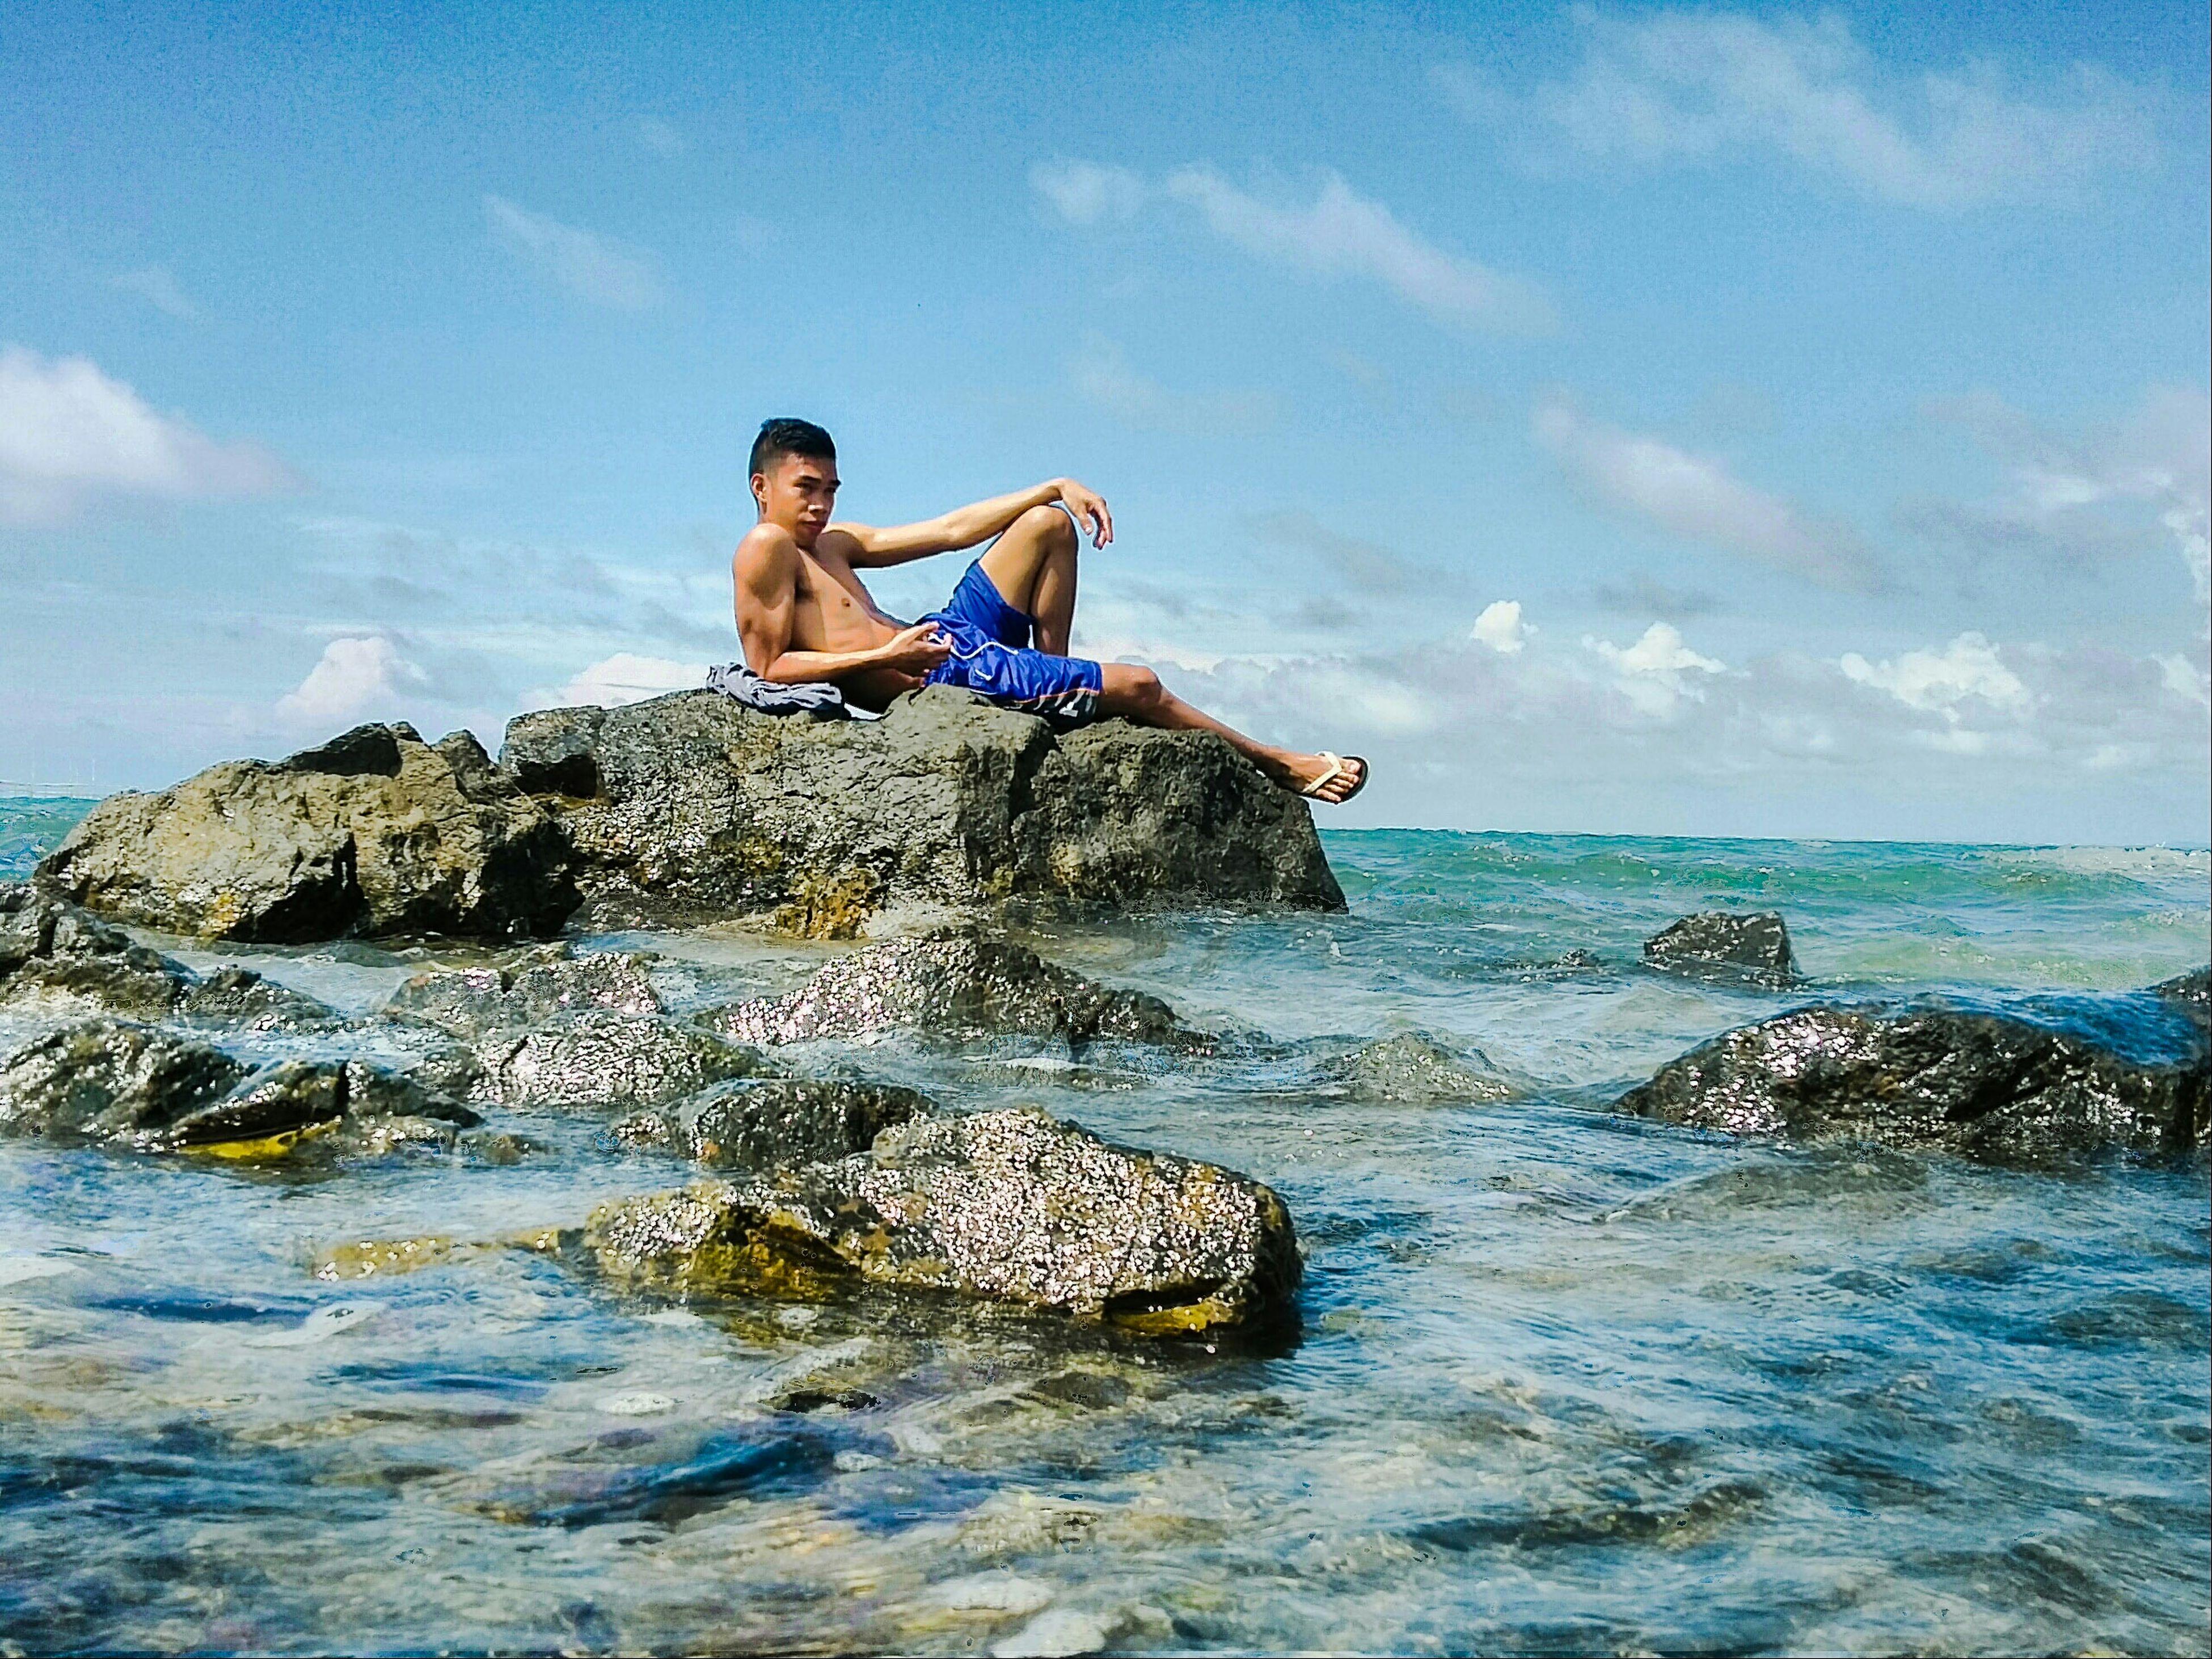 When in Iloilo. Random phone shots fresh from LULI(lulubog lilitaw island)... HDR Luli Lulubog Lilitaw Island Banate,iloilo Seashore Beach Scenery Taking Photos Enjoying Life Hanging Out